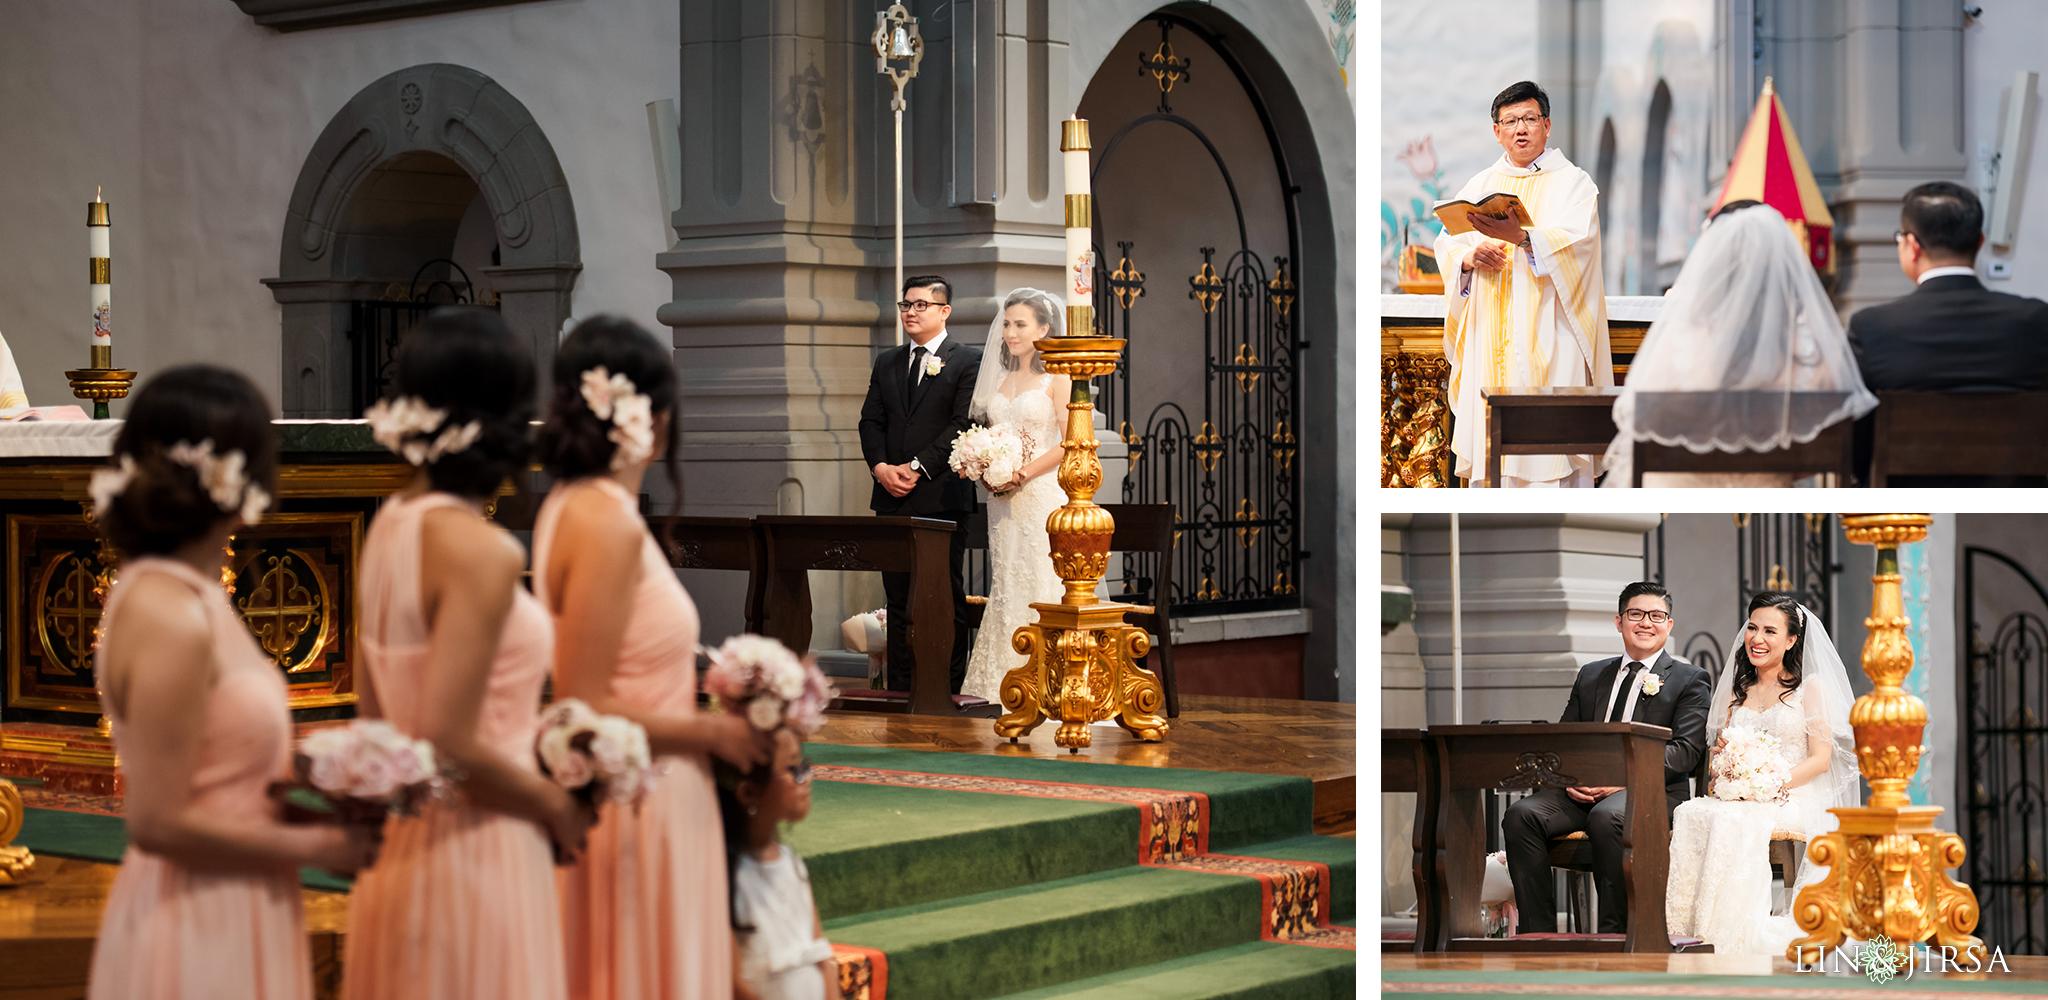 16 Mission Basilica San Juan Capistrano Wedding Photography